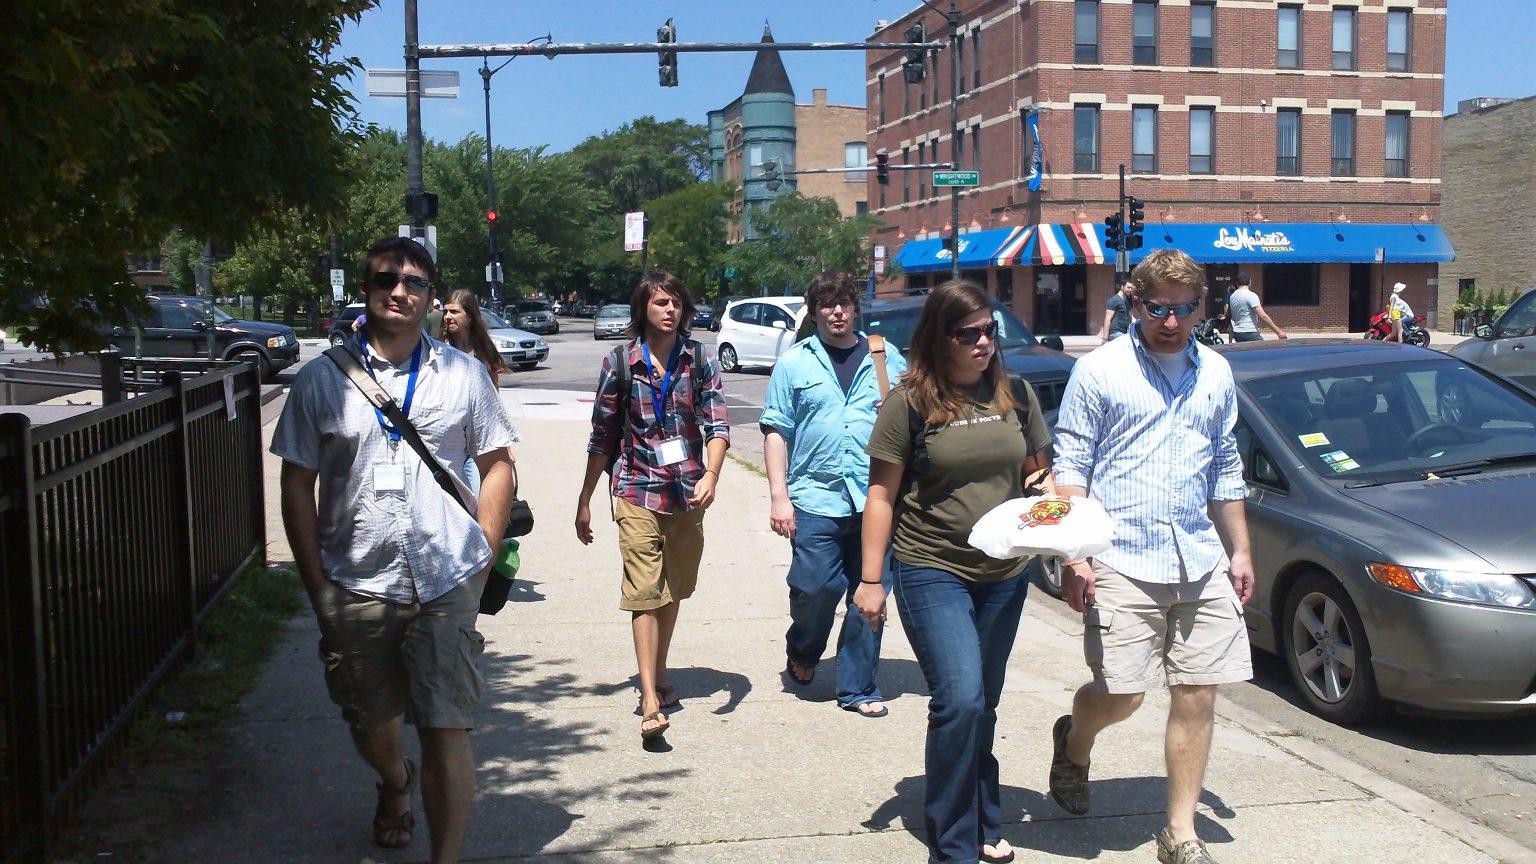 Group of people walking along the sidewalk